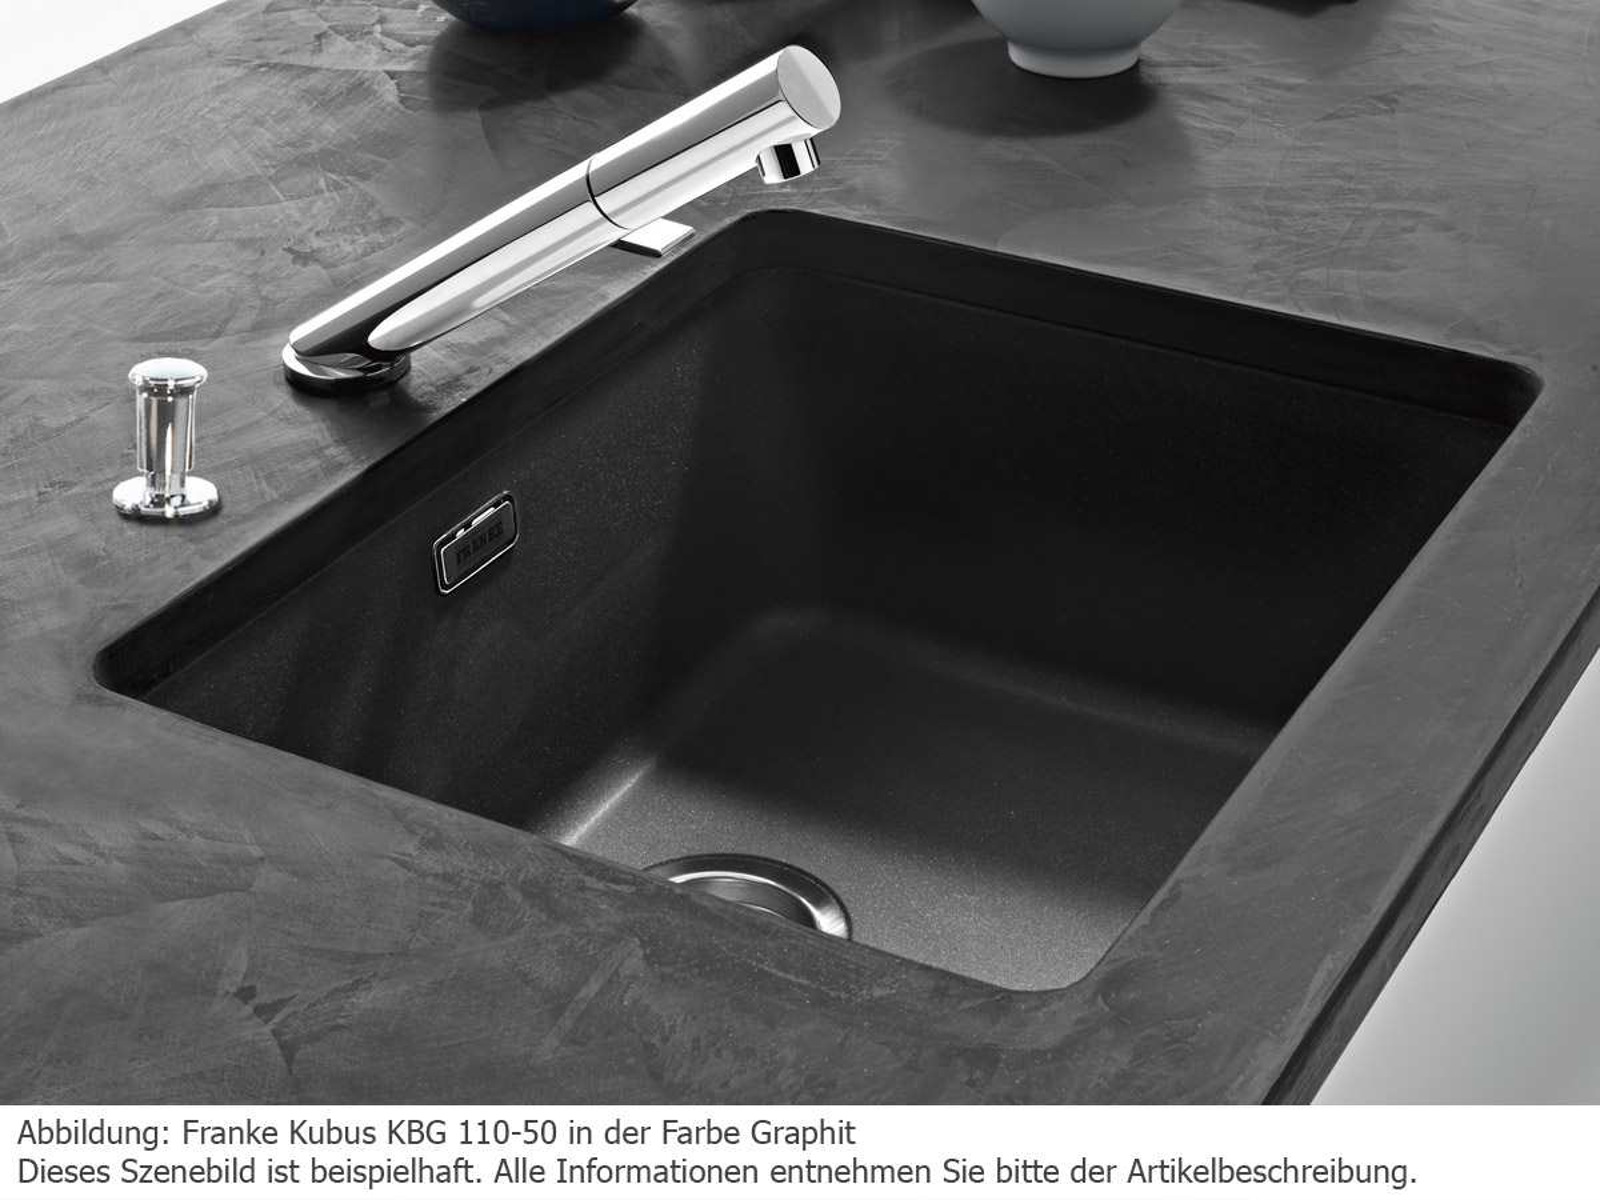 Franke Kubus KBG 110-50 Beige Granitspüle